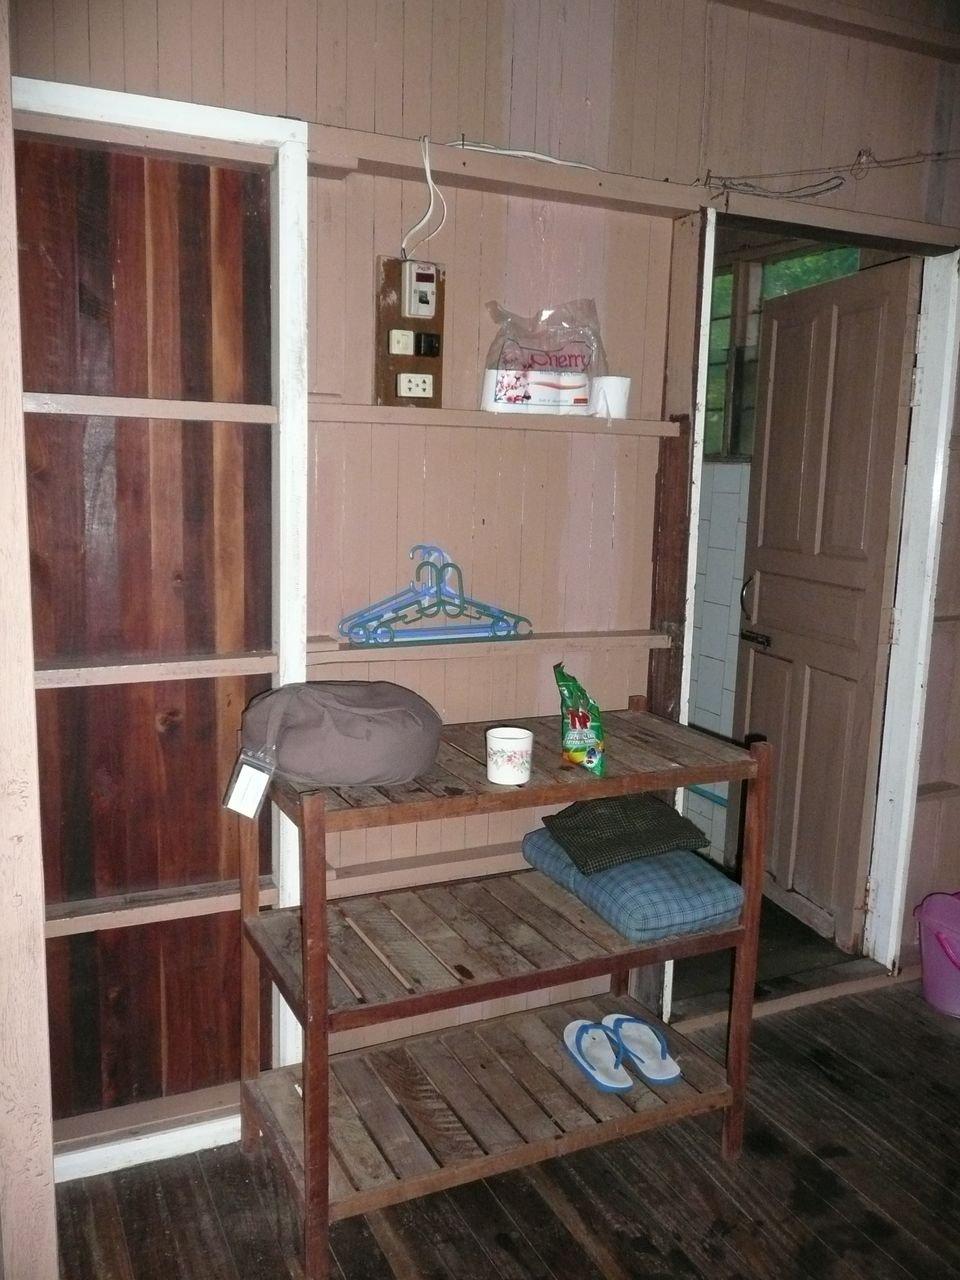 2011 Burmai Meditációs Központ